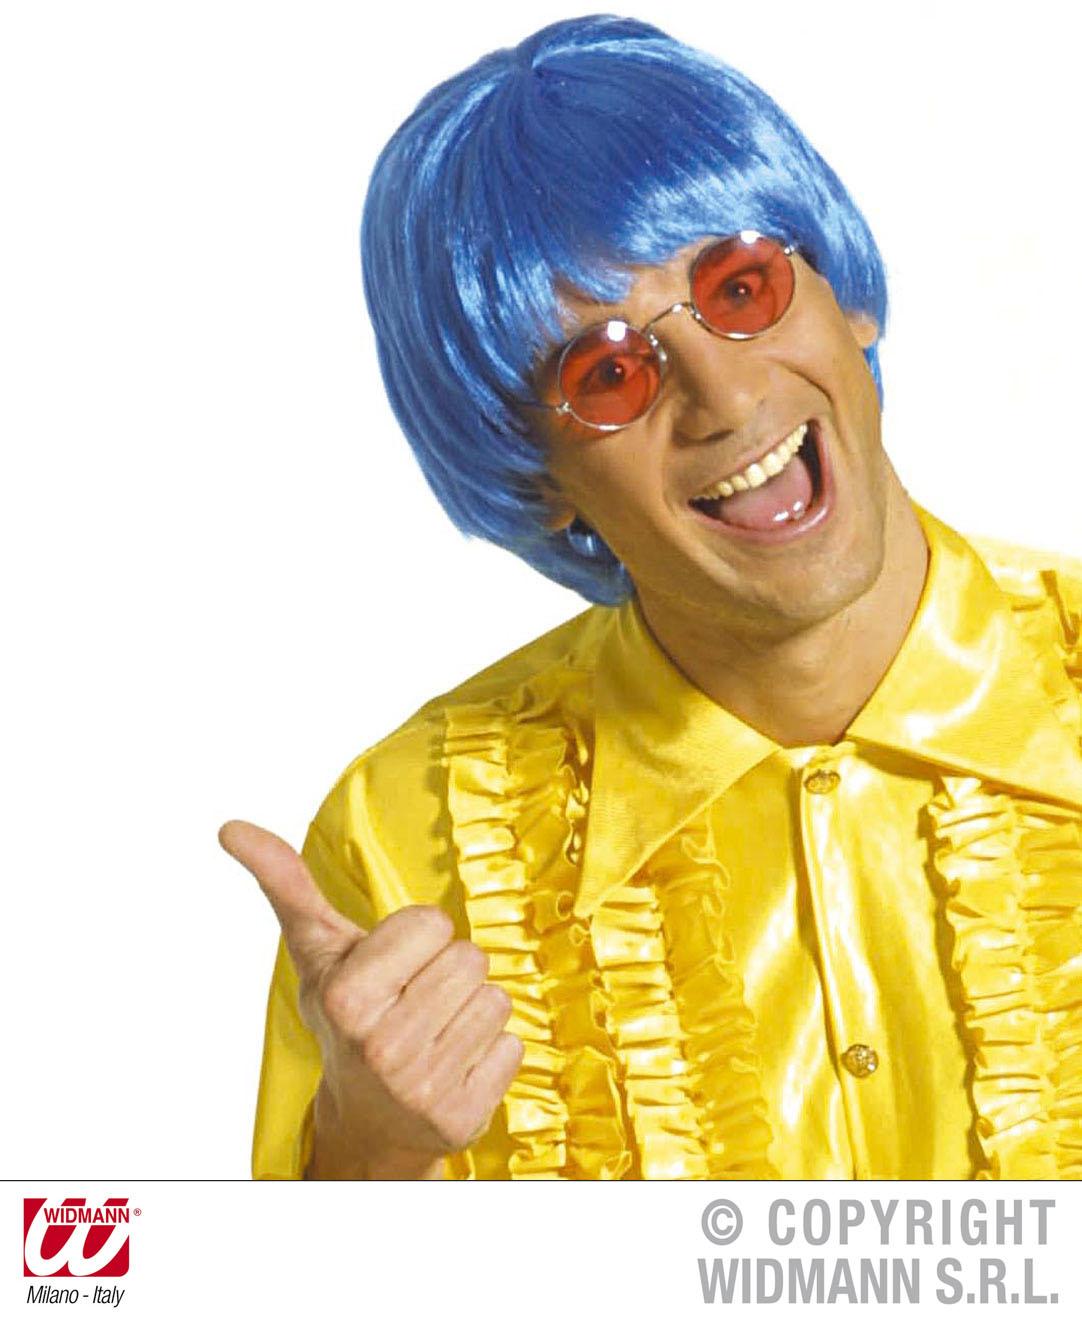 Short Neon Blue Wig Unisex Hippy 70's Austin powers Fancy Dress